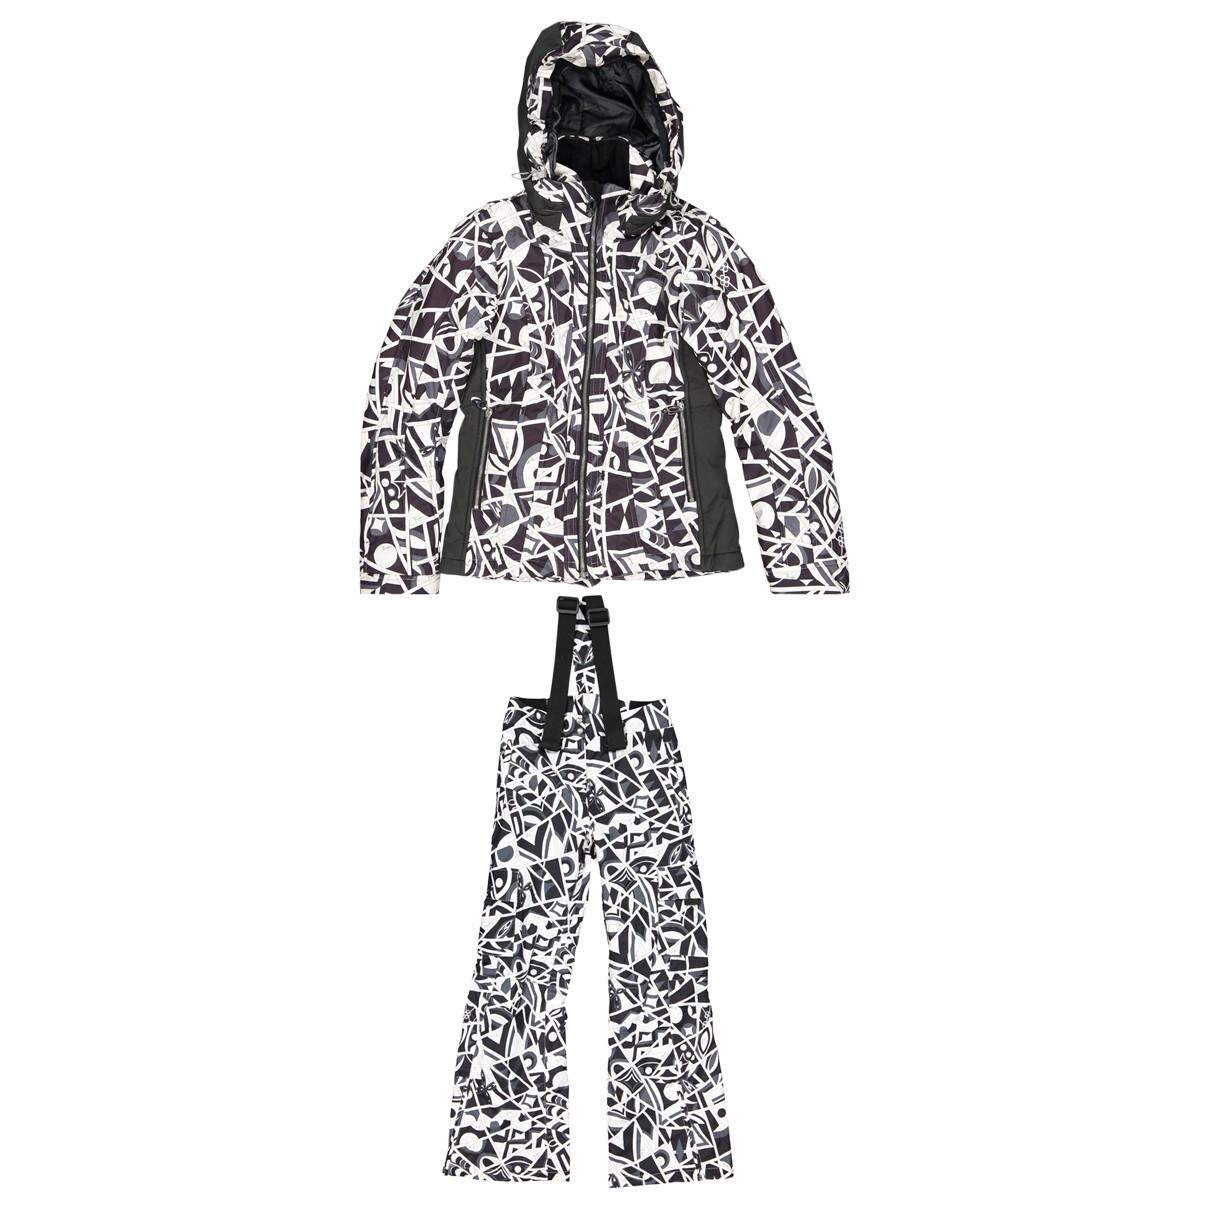 Emilio Pucci \N Black jumpsuit for Women M International